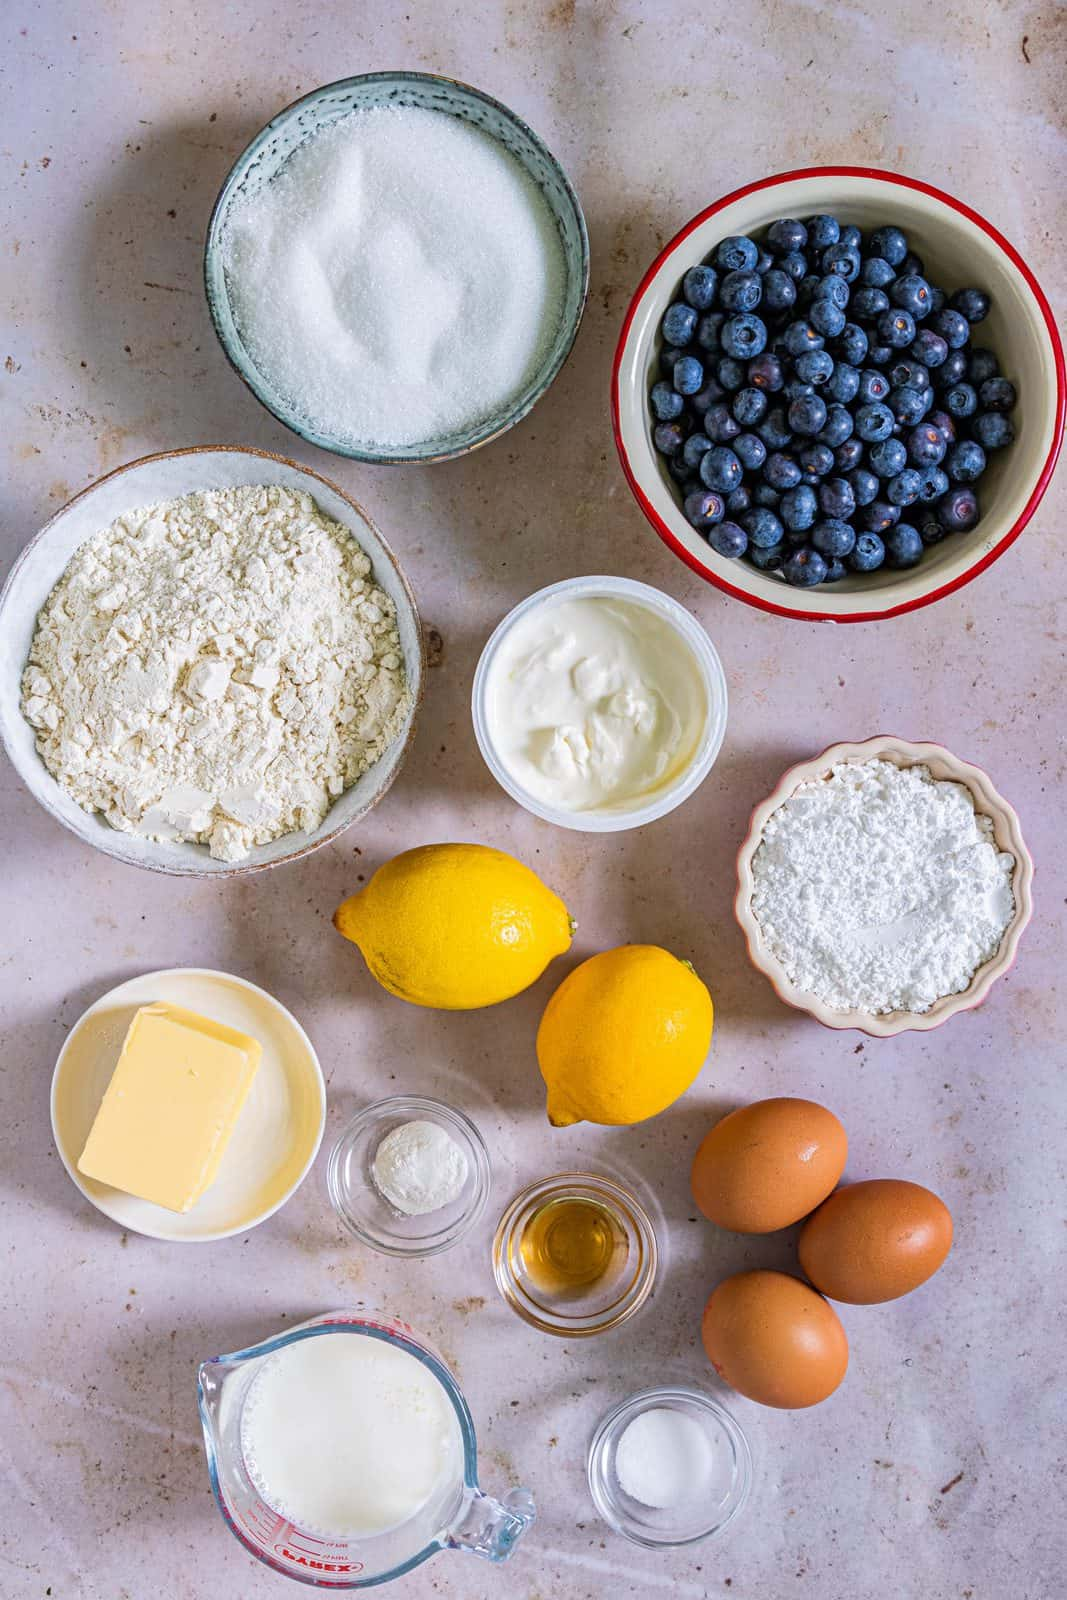 Ingredients needed to make bundt cake: all-purpose flour, baking powder, salt, blueberries, unsalted butter, granulated sugar, vanilla extract, eggs, buttermilk, sour cream, lemon juice, lemon zest and powdered sugar.